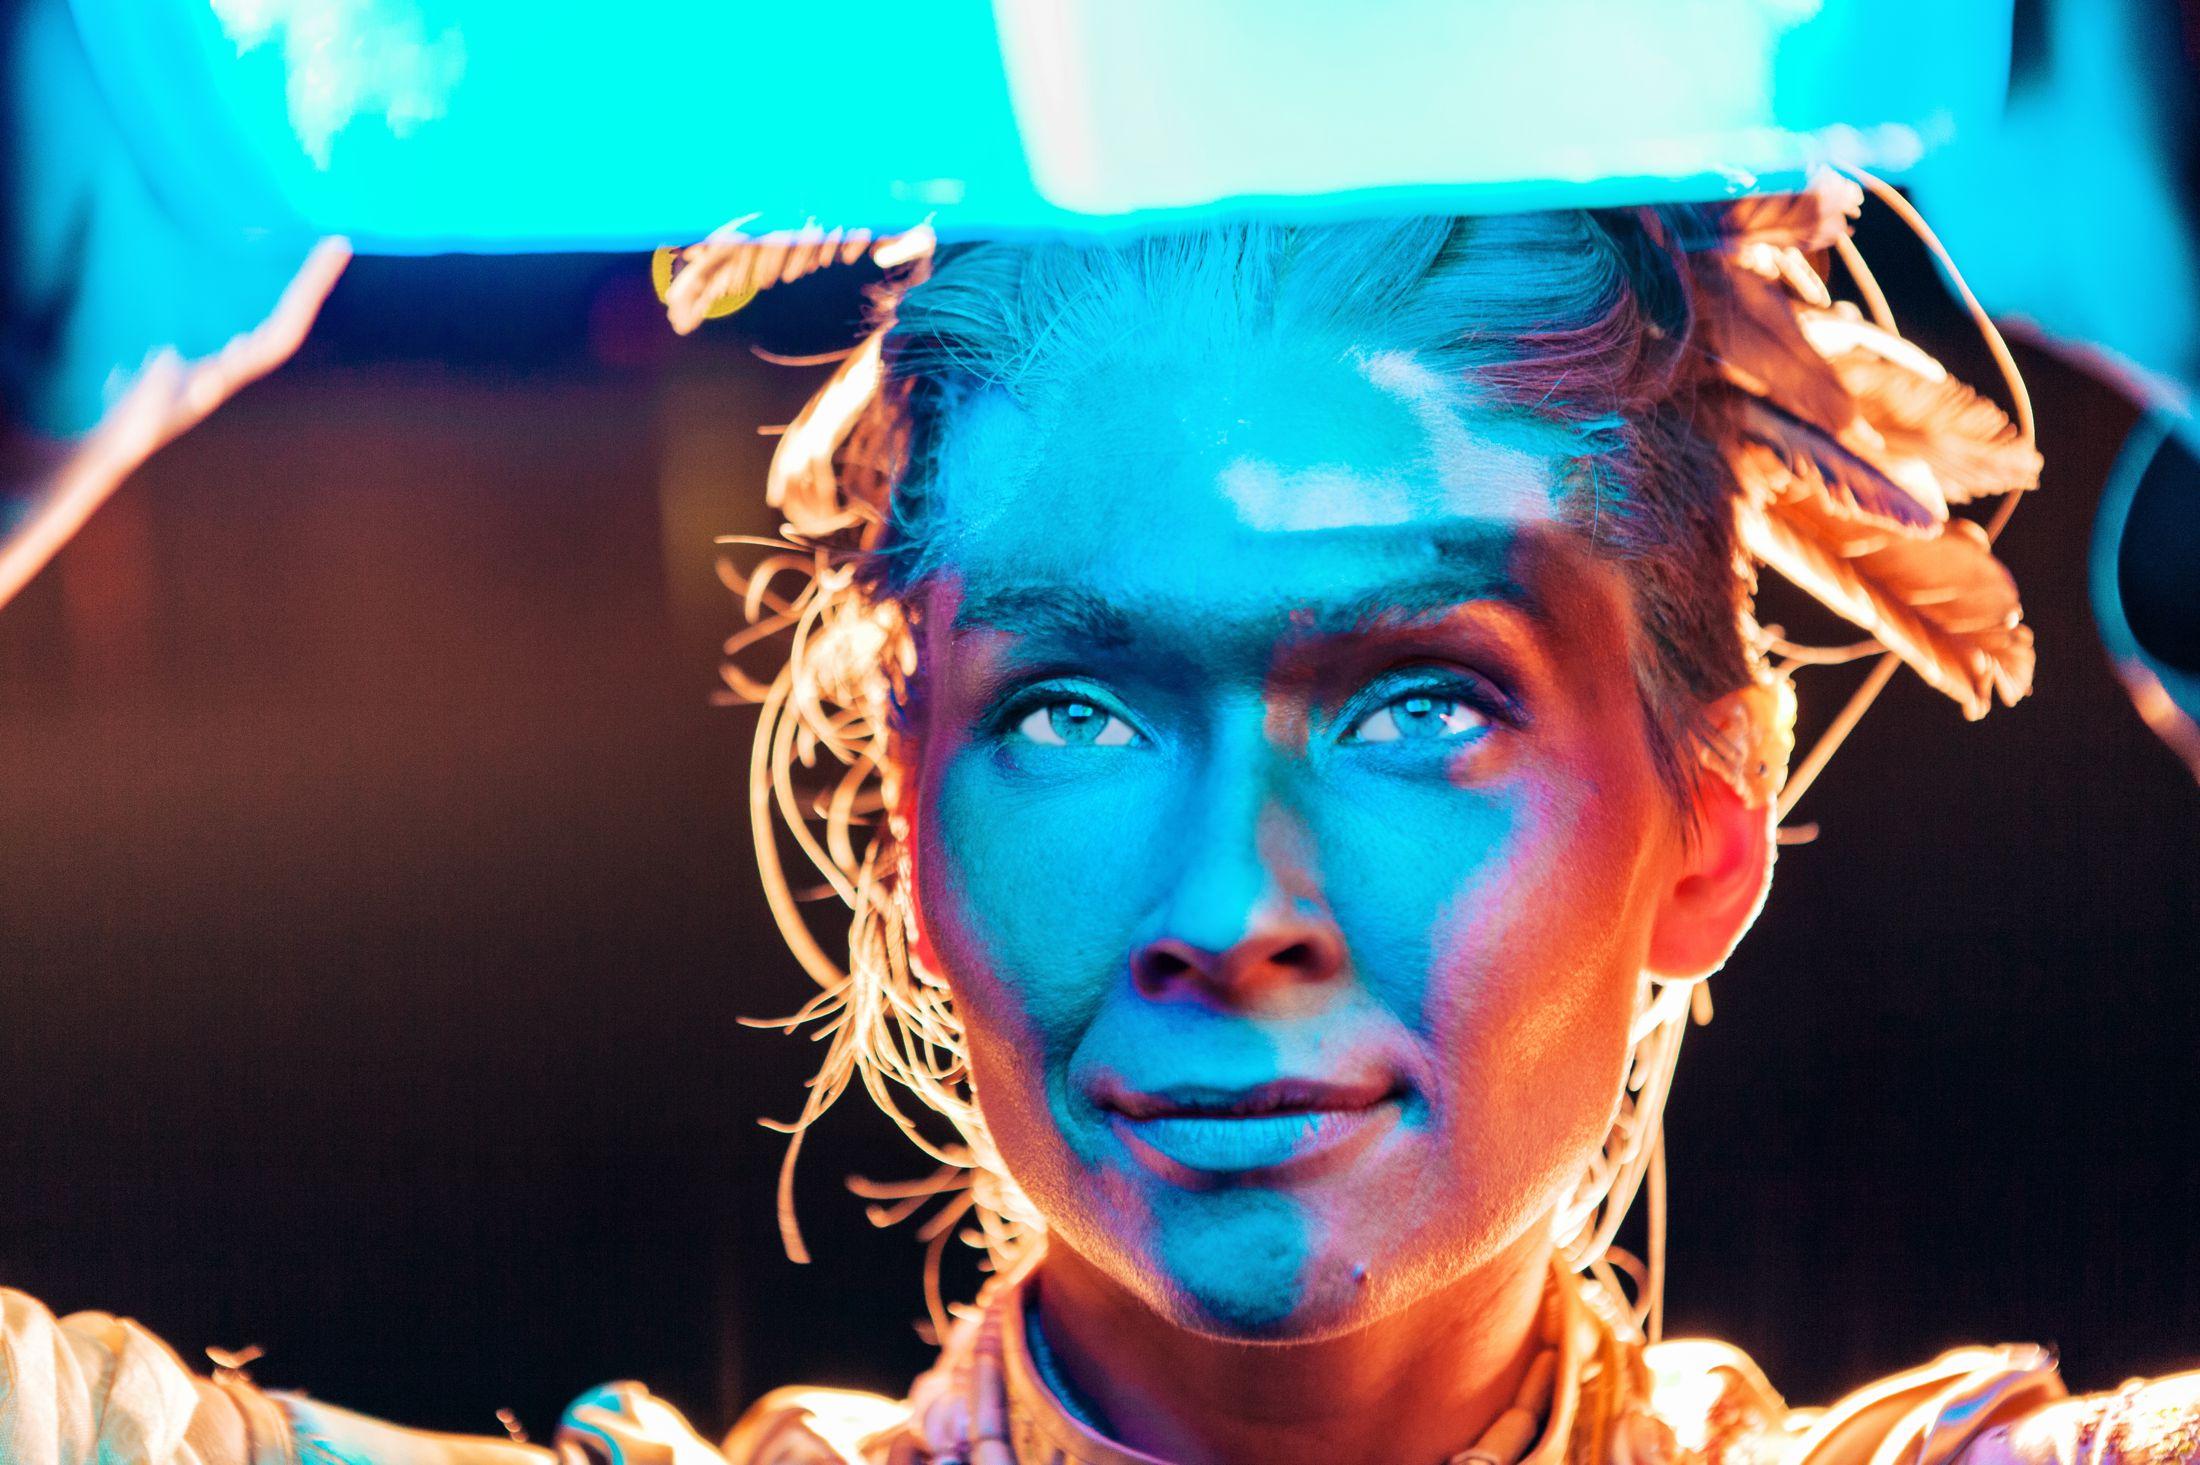 Electric Forest yoga LED light nomad festival style ethnic global fashion shoot warpaint tribal 23.jpg